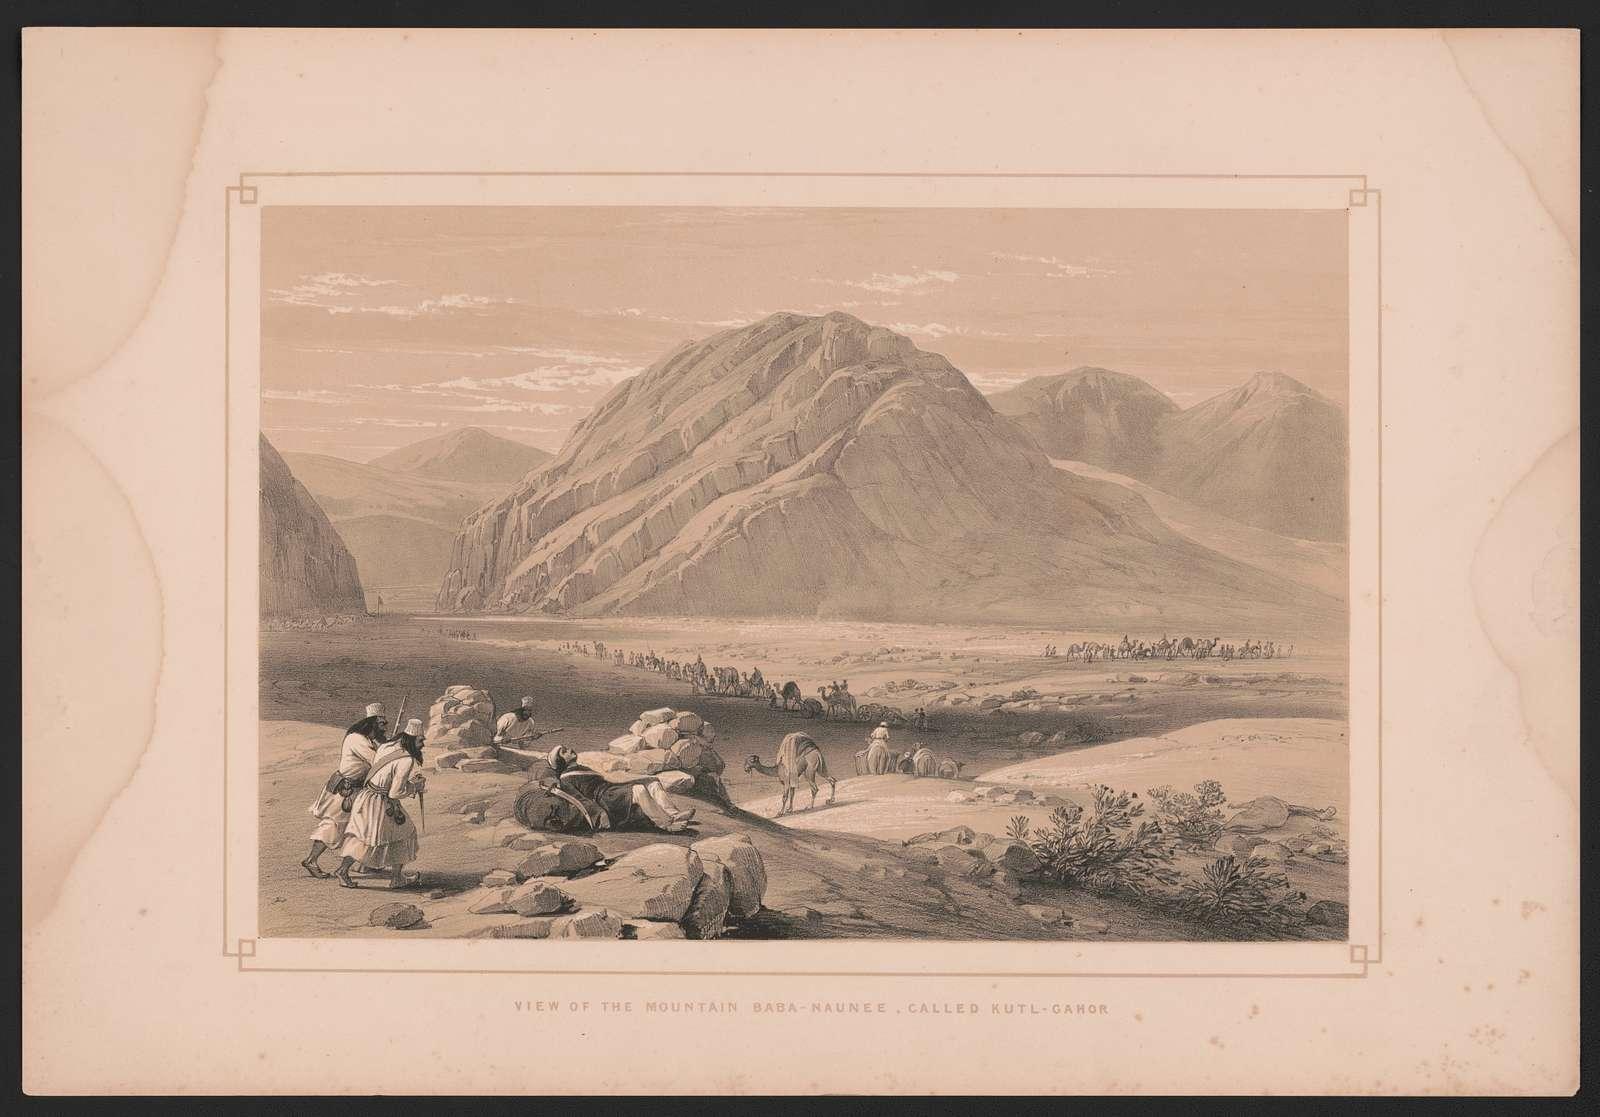 View of the mountain Baba-Naunee, called Kutl-Gahor